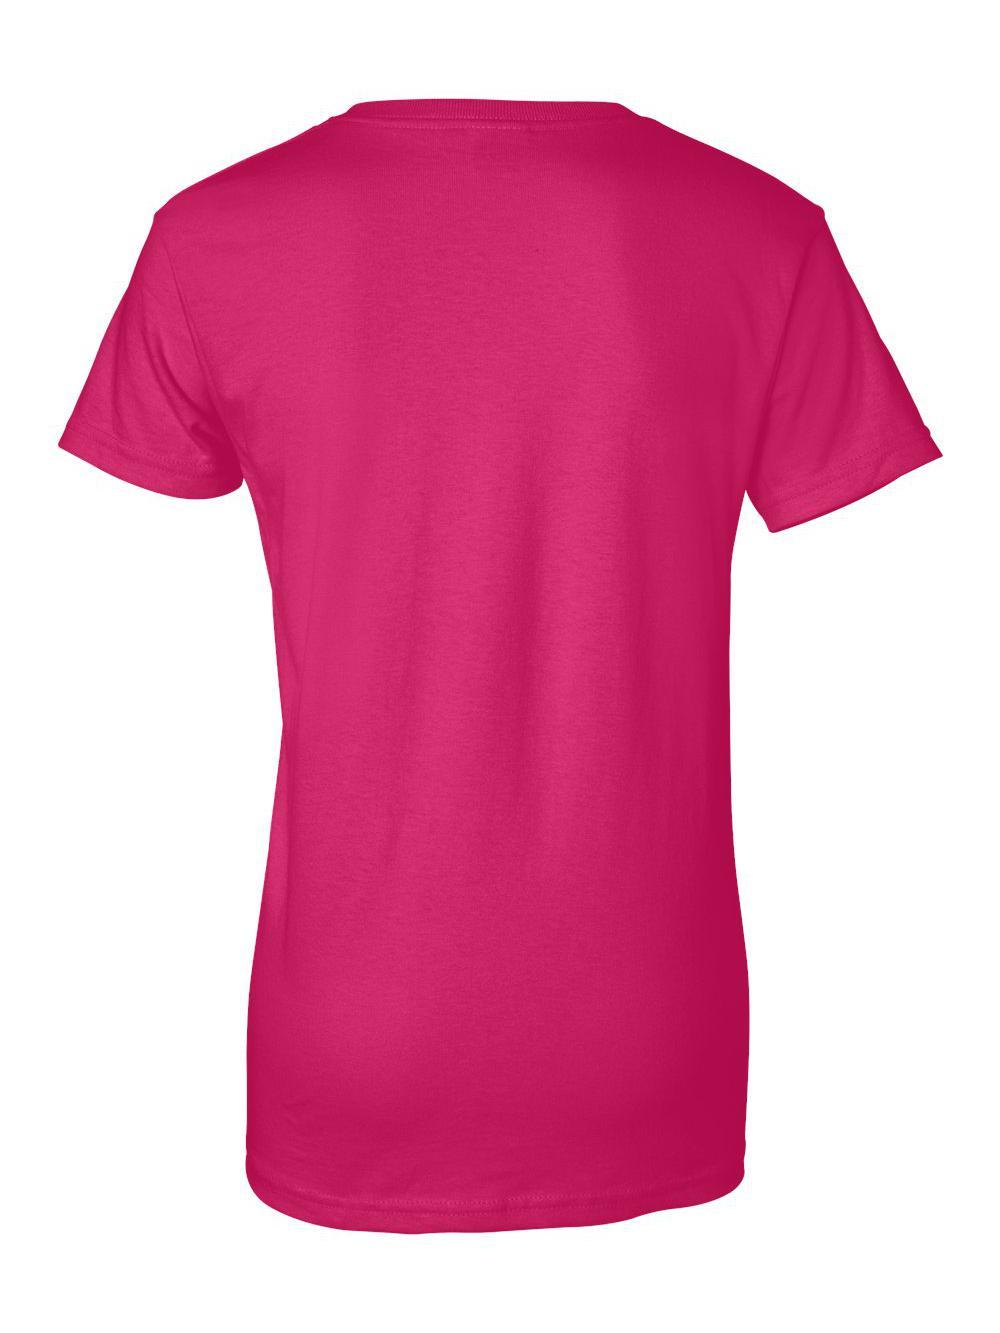 Gildan-Ultra-Cotton-Women-039-s-T-Shirt-2000L thumbnail 25